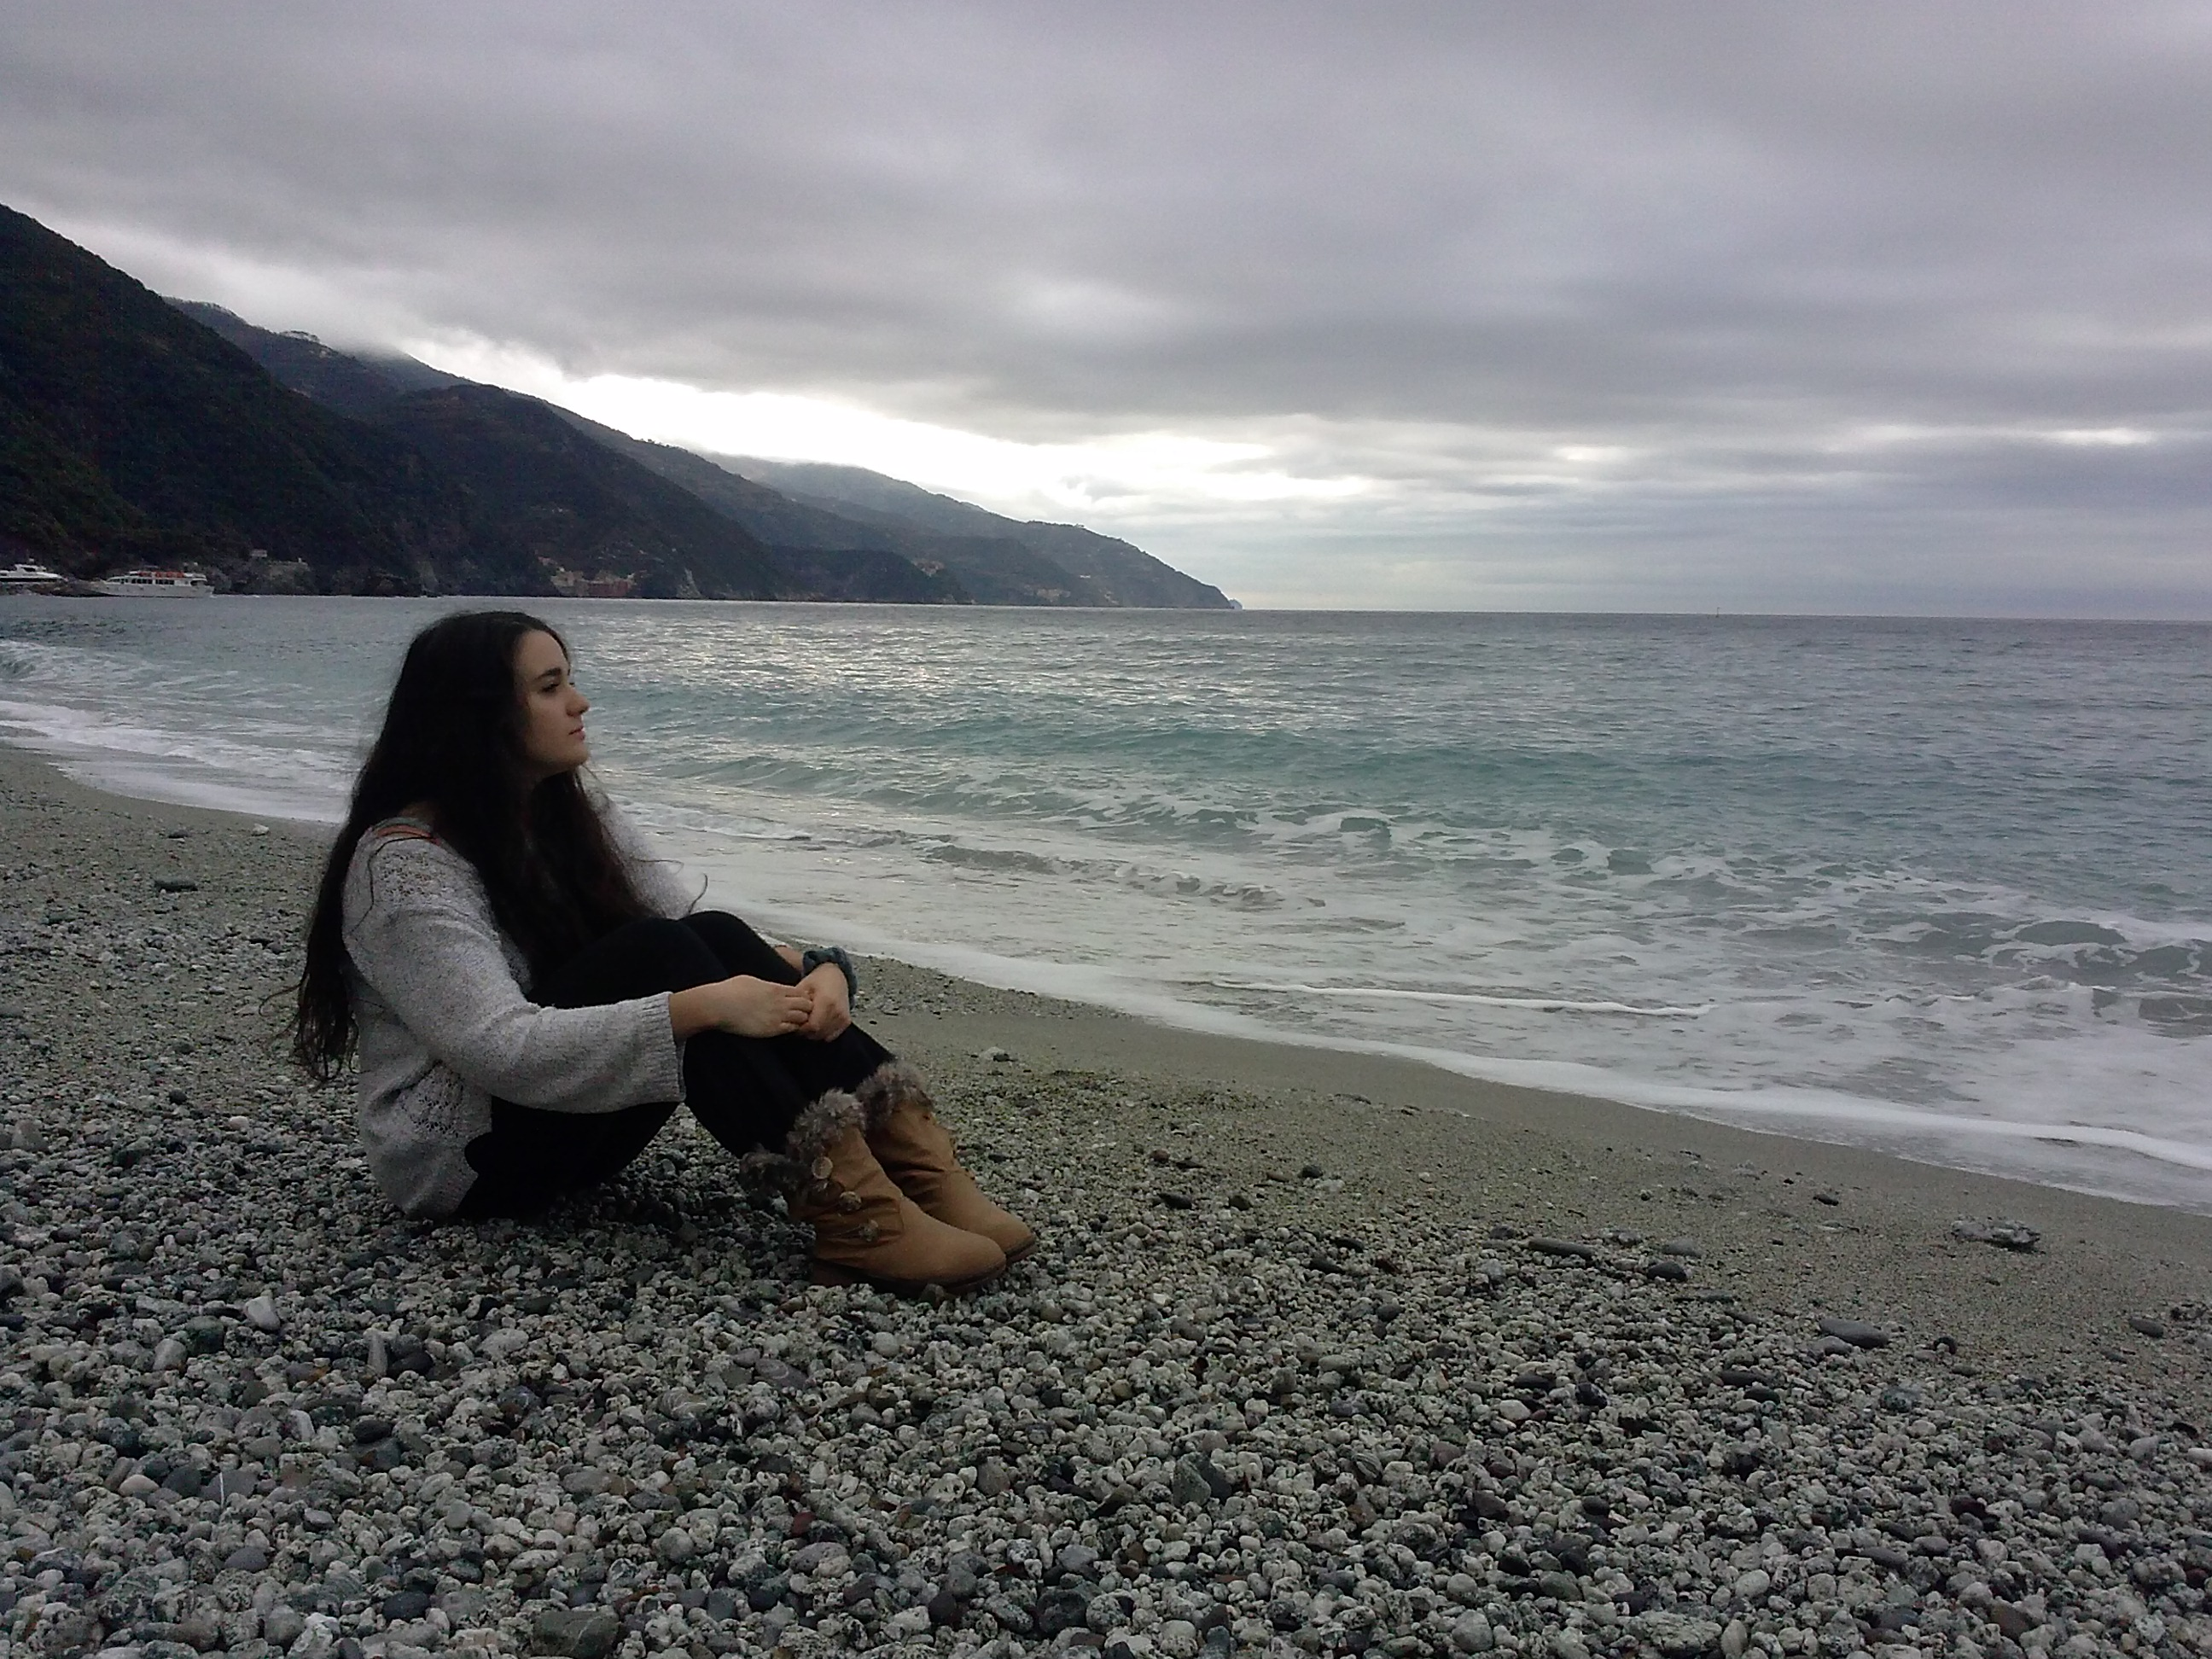 CAPAStudyAbroad_London_Fall2015_From_Alyssa_Reimenschneider_-_Trip_to_Cinque_Terre_Italy